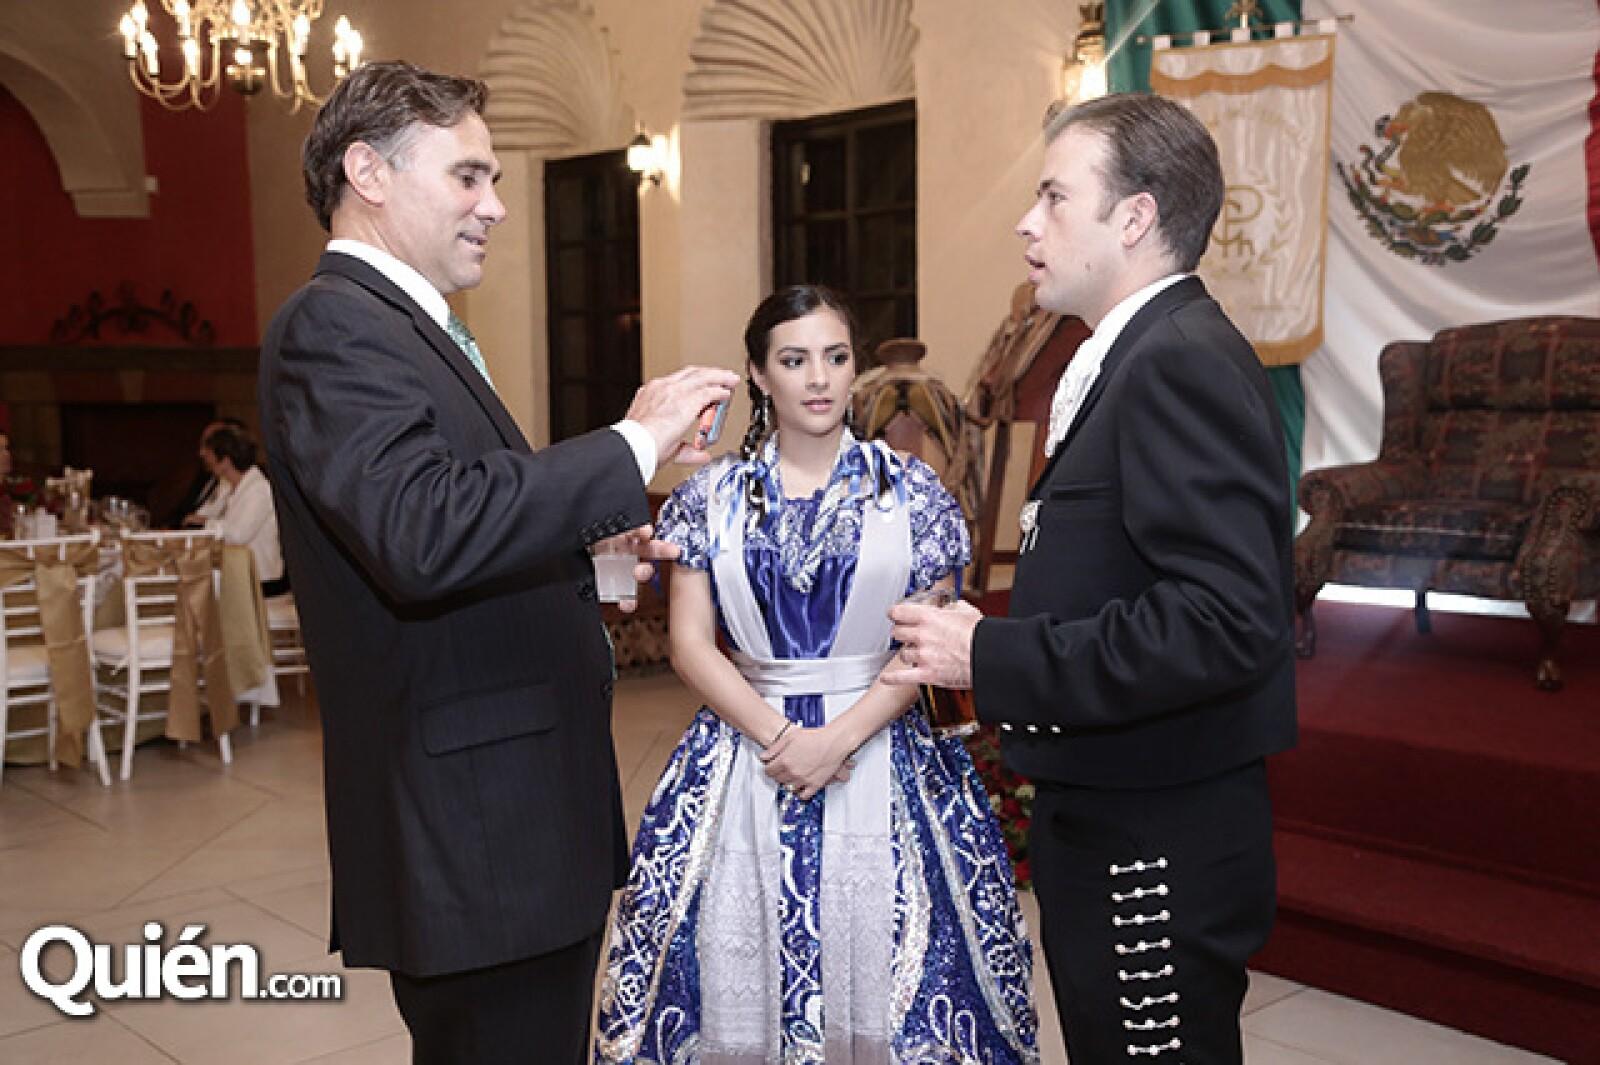 Paul Roberti, Berny y Mariana Arenas